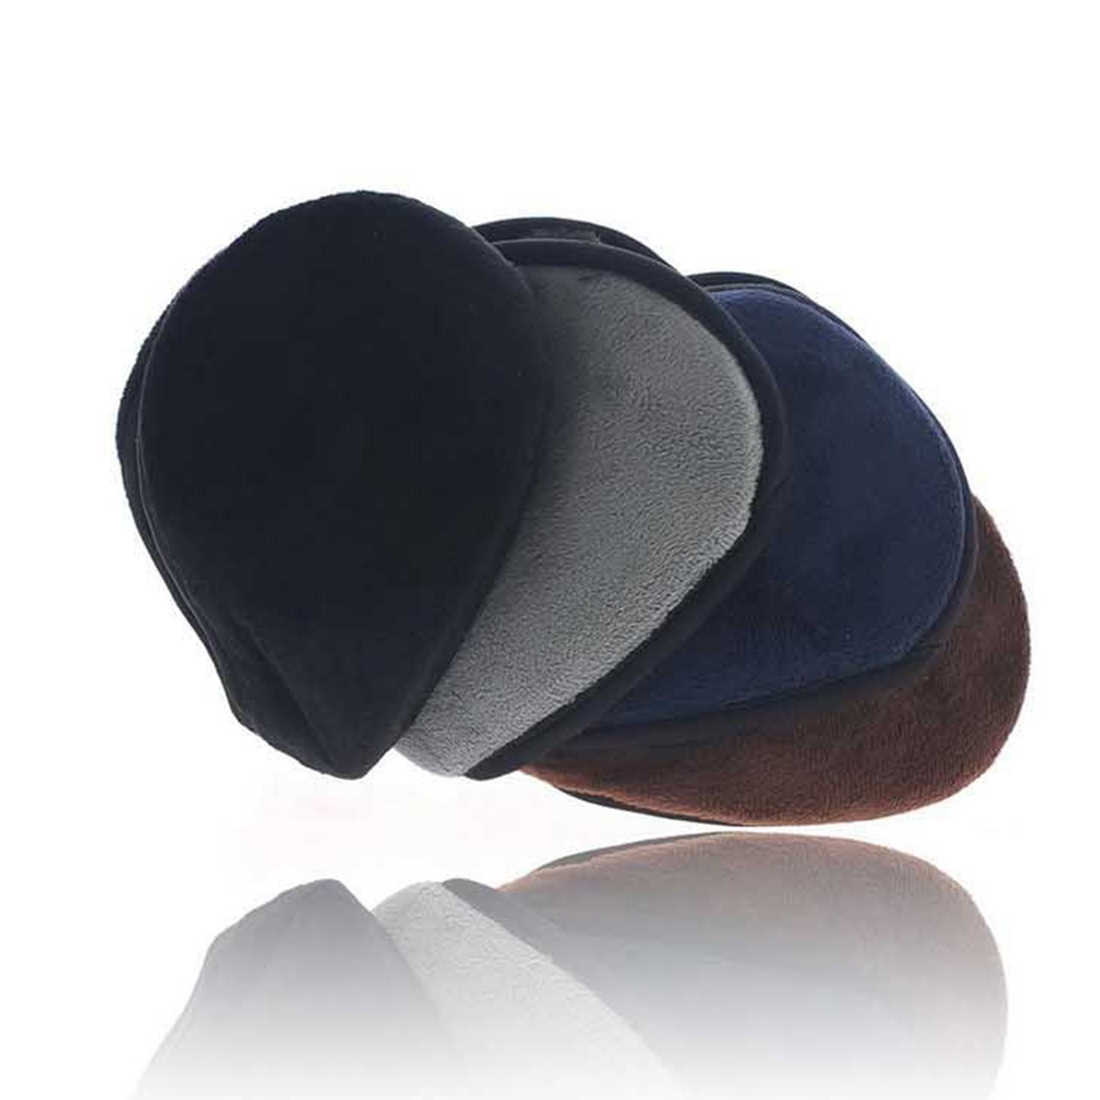 Comfortable Men Women Unisex Soft Comfortable Fleece Wrap Around Headwear Autumn Winter Ear Warmers Earmuffs